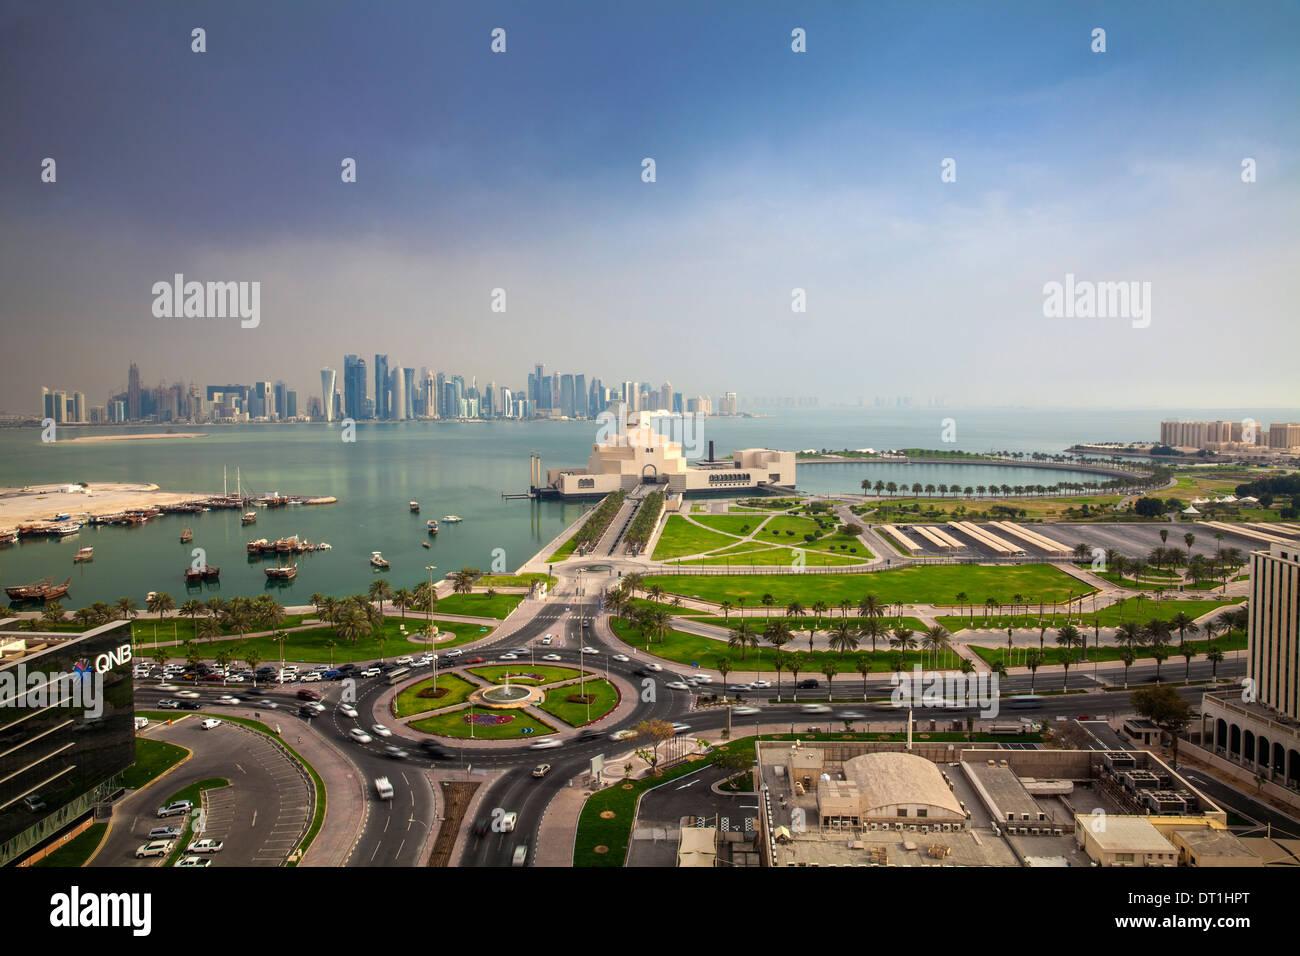 Museum of Islamic Art, Doha, Qatar, Middle East - Stock Image